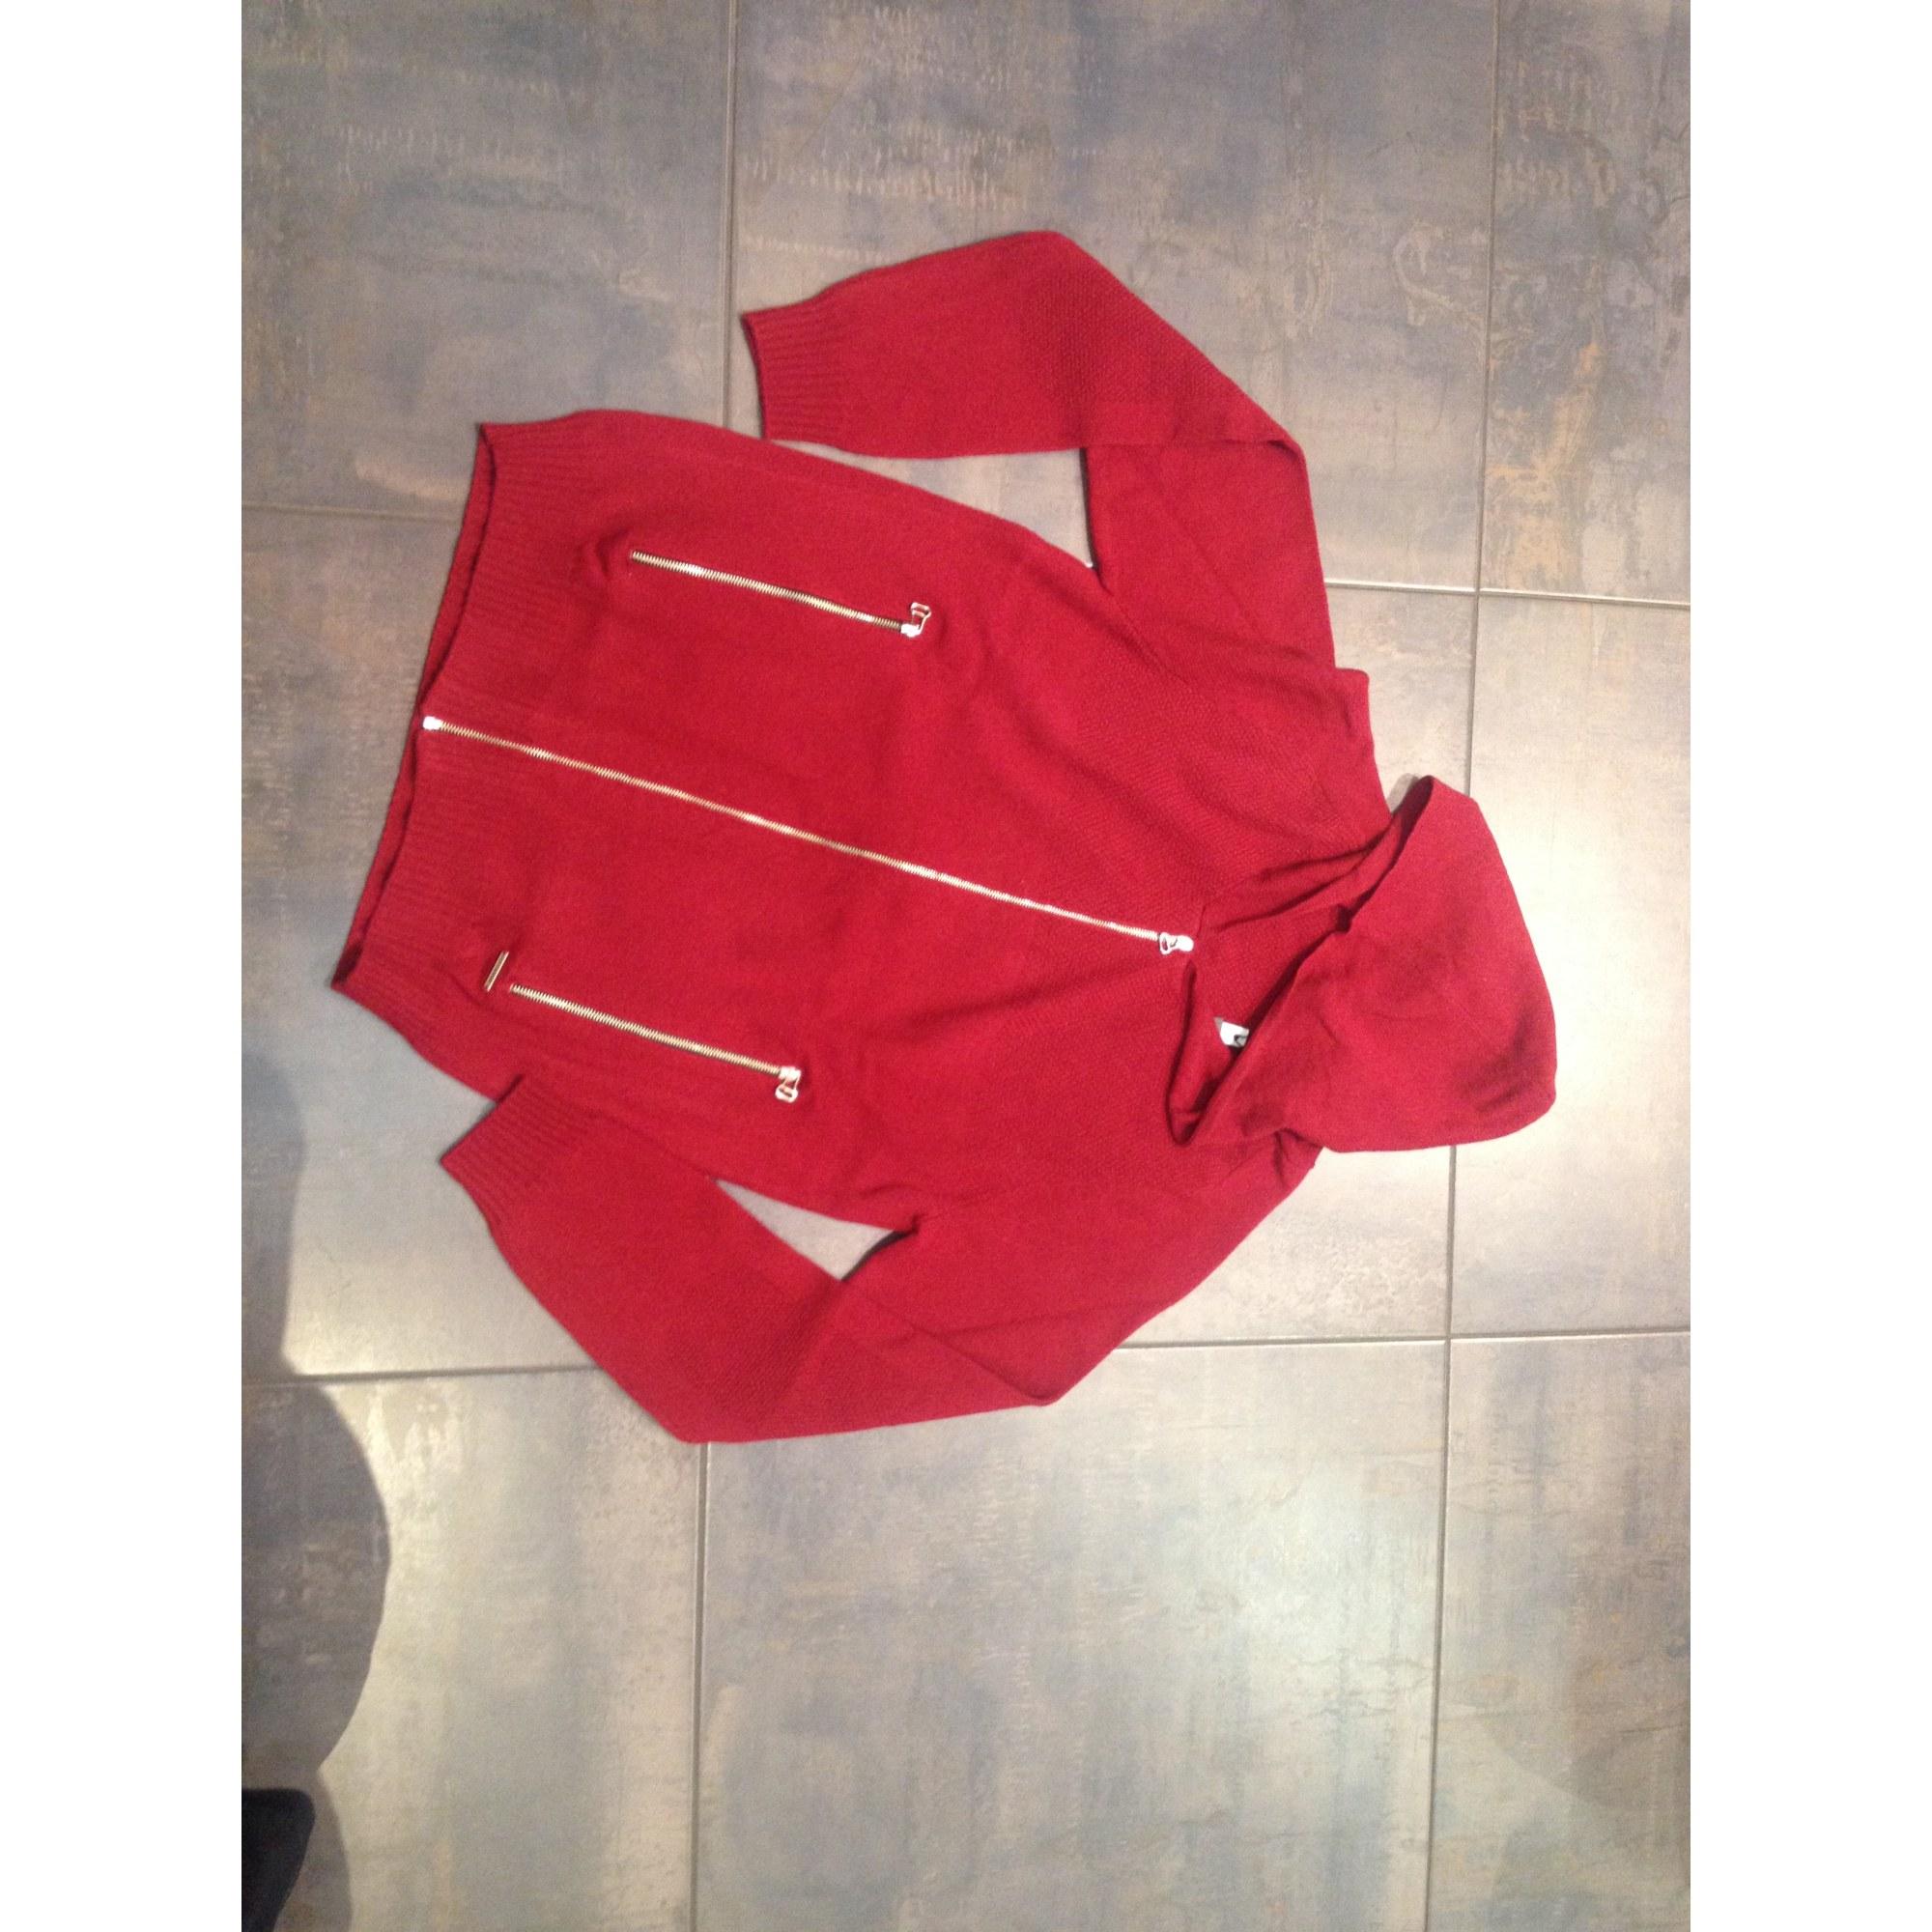 Gilet, cardigan BILLTORNADE Rouge, bordeaux